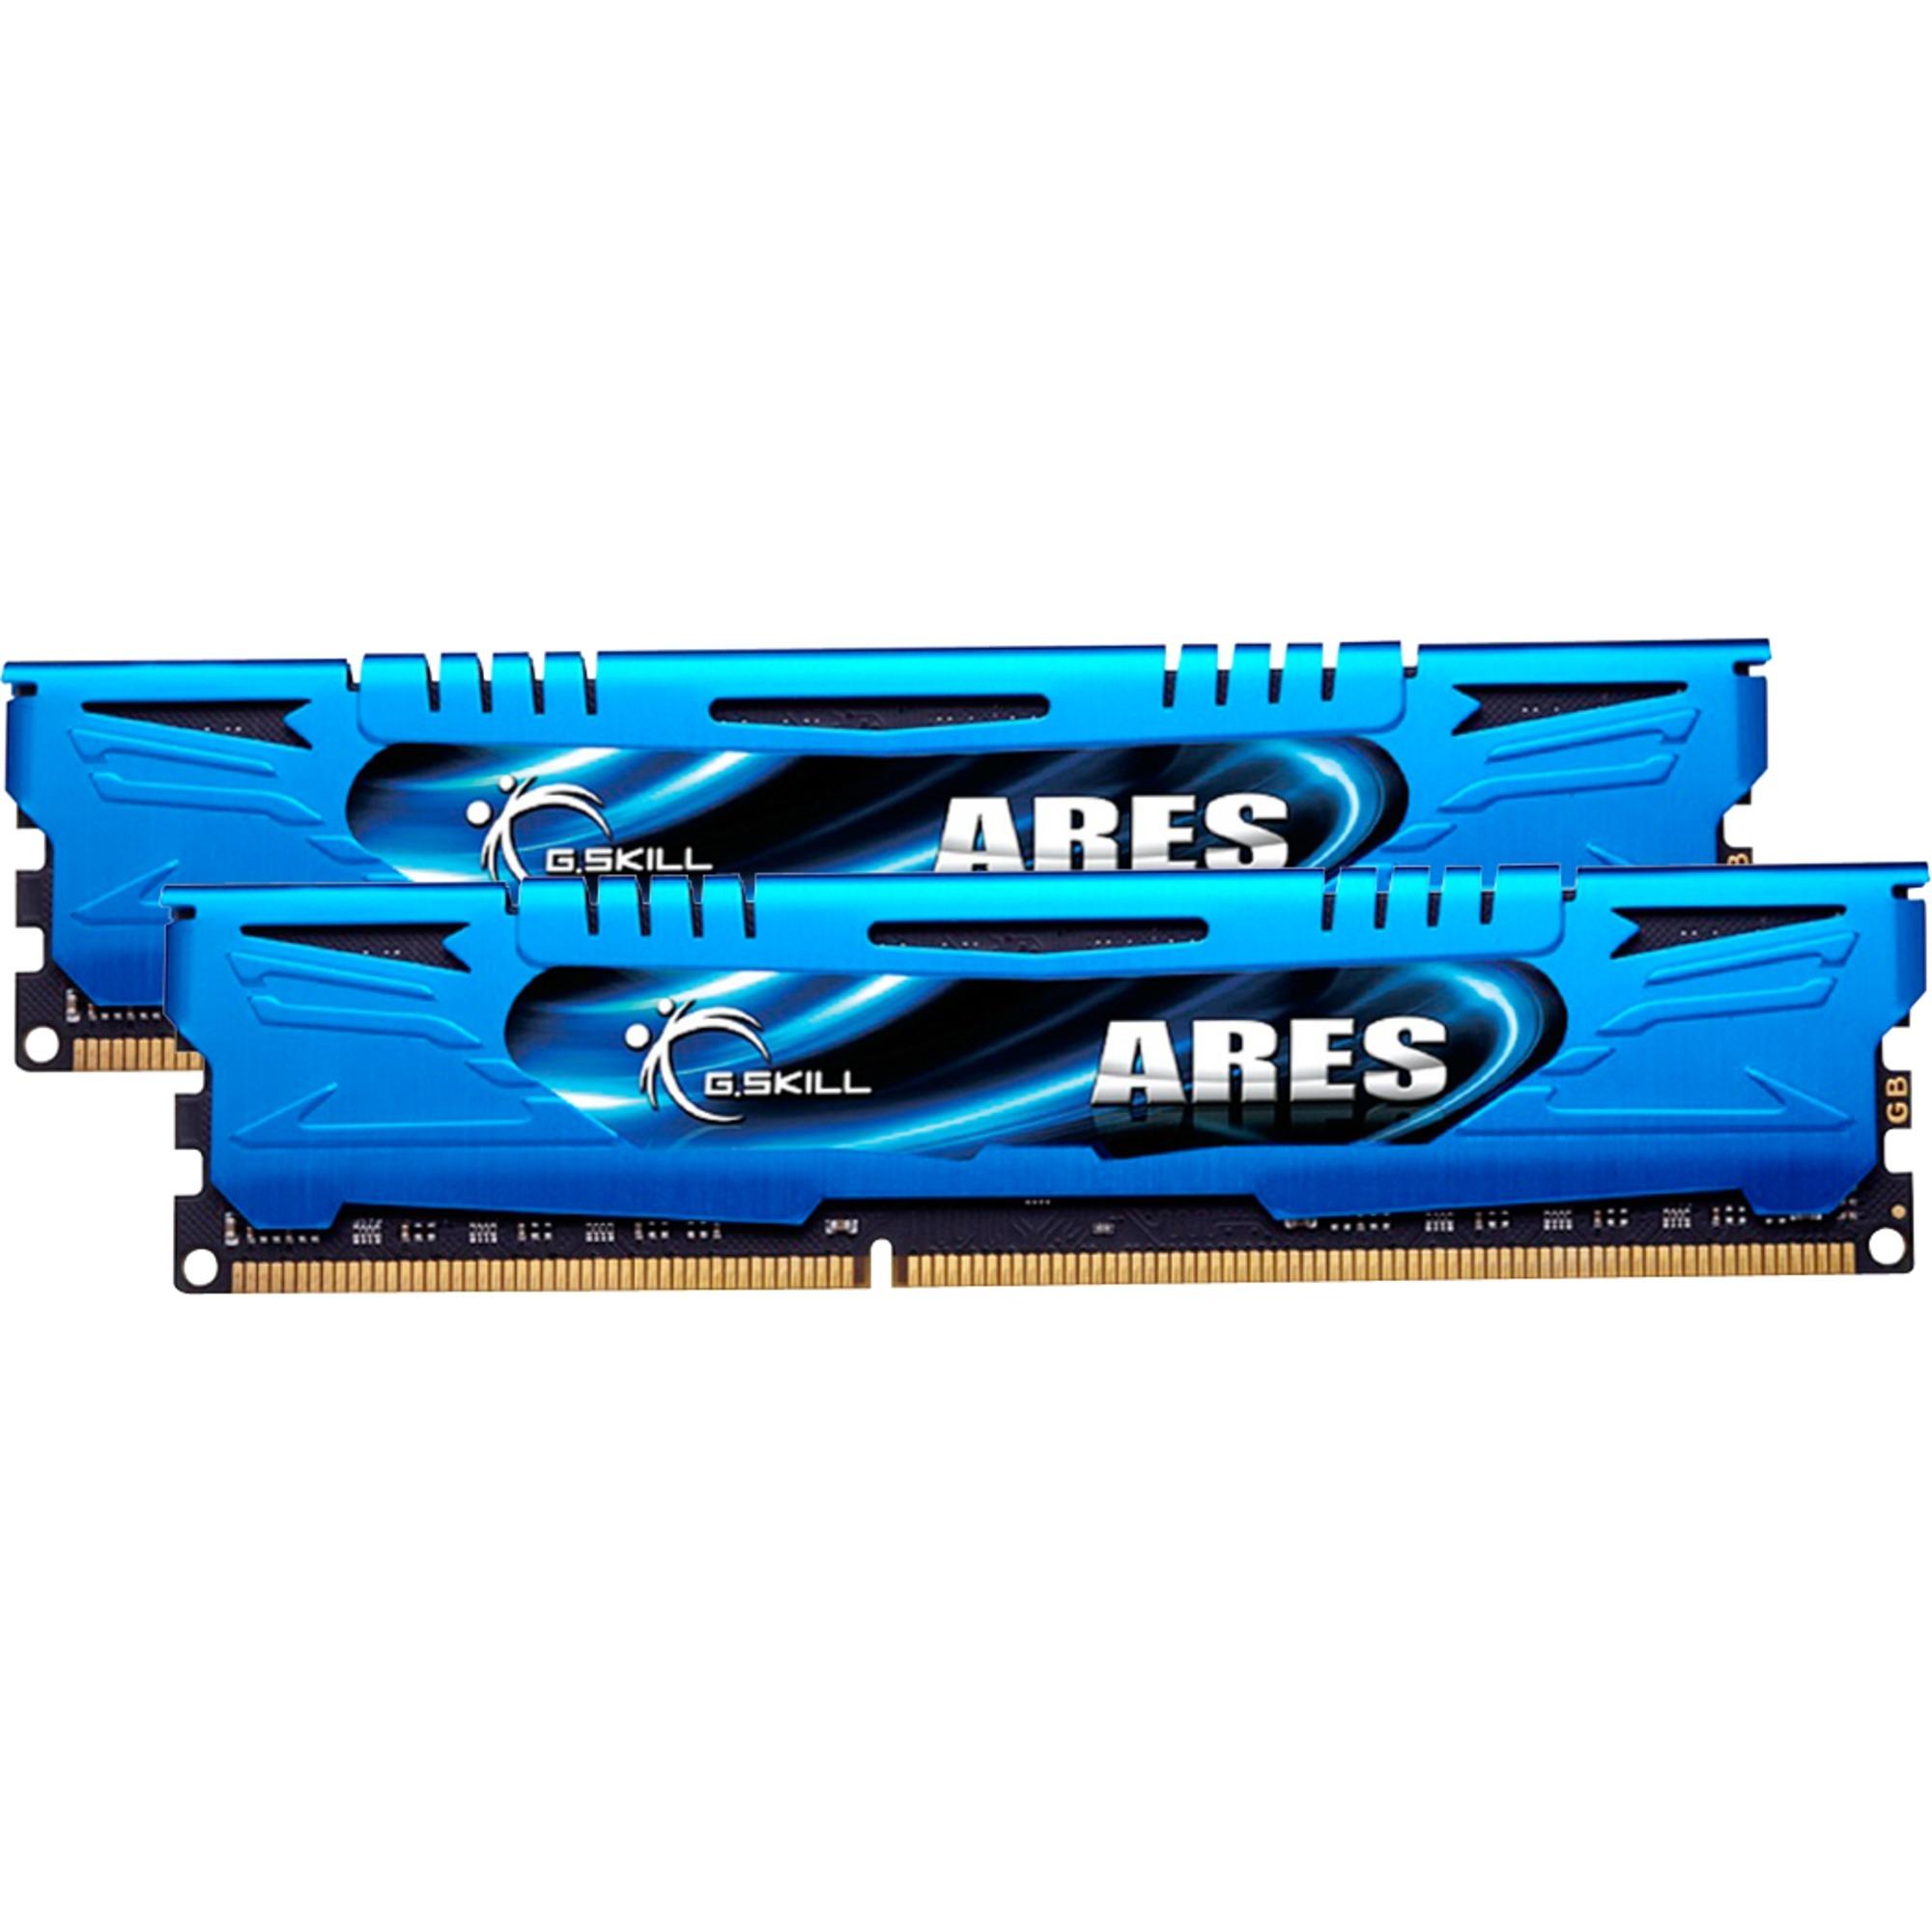 16GB DDR3-1866 módulo de memoria 1866 MHz, Memoria RAM